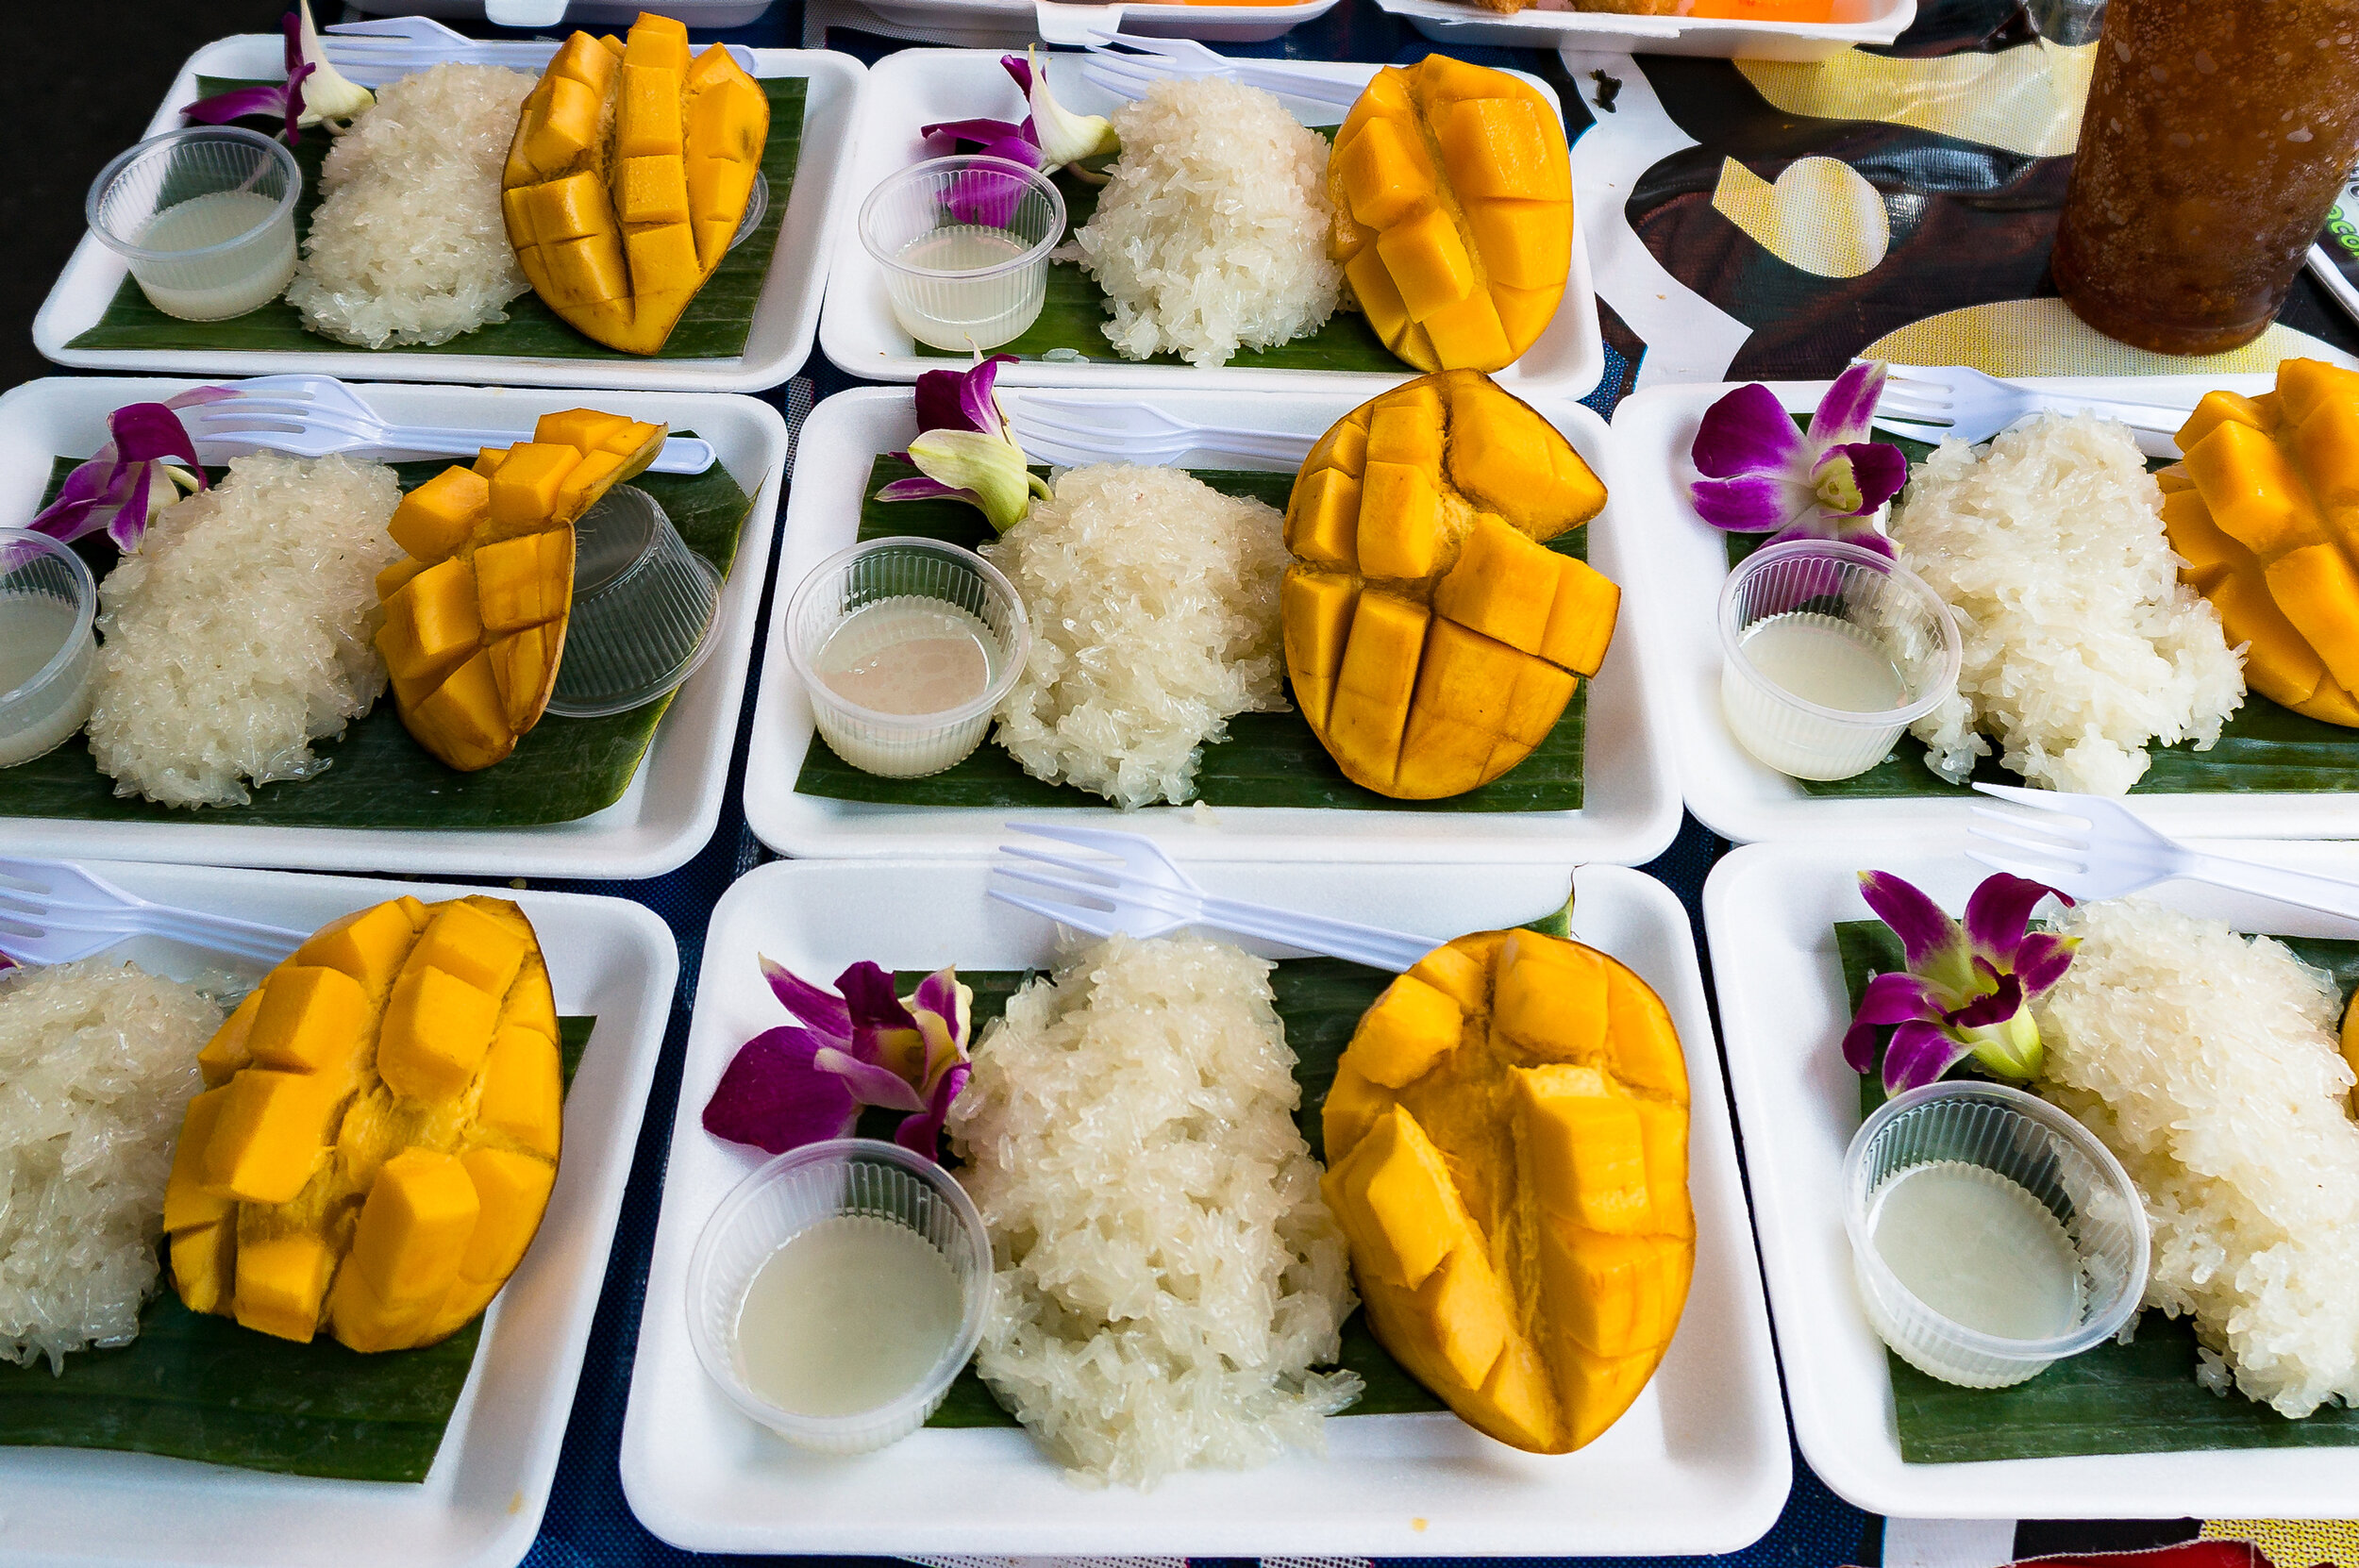 Dessert Thai street food, mango sticky rice in Bangkok.